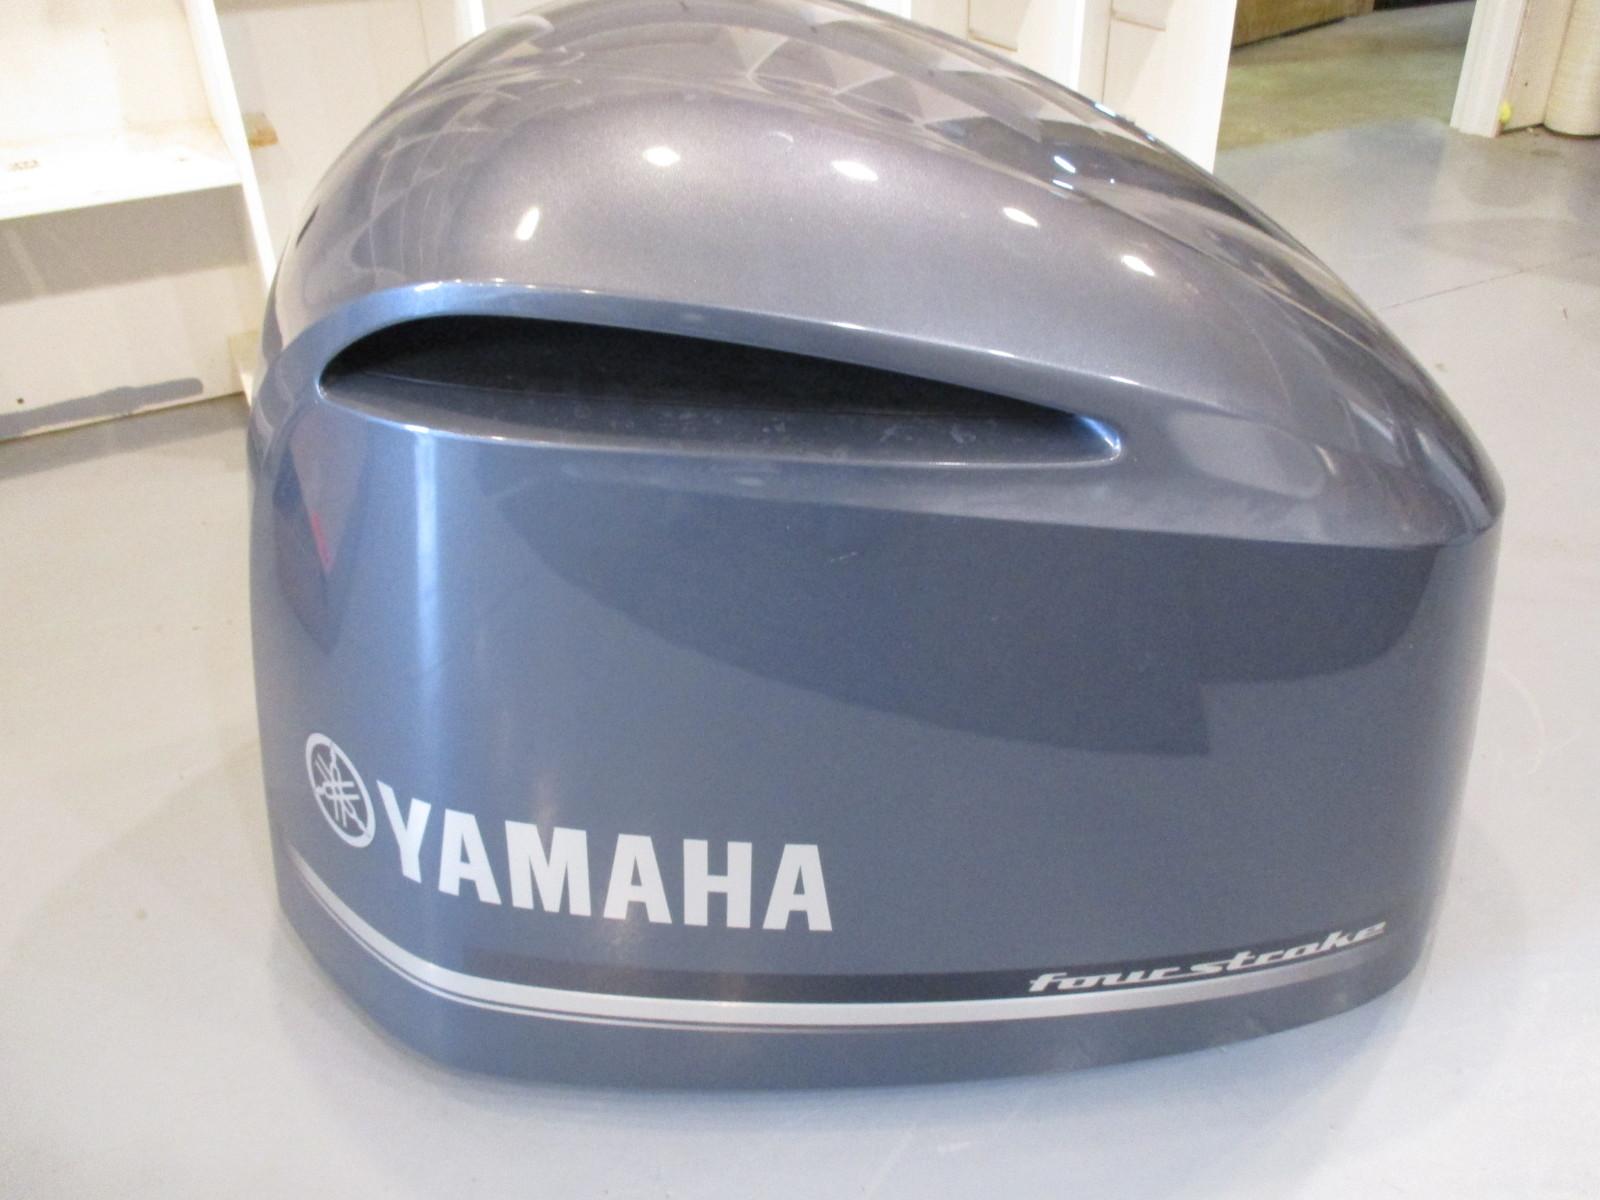 Yamaha Scorpio Sx 4 Service Manual